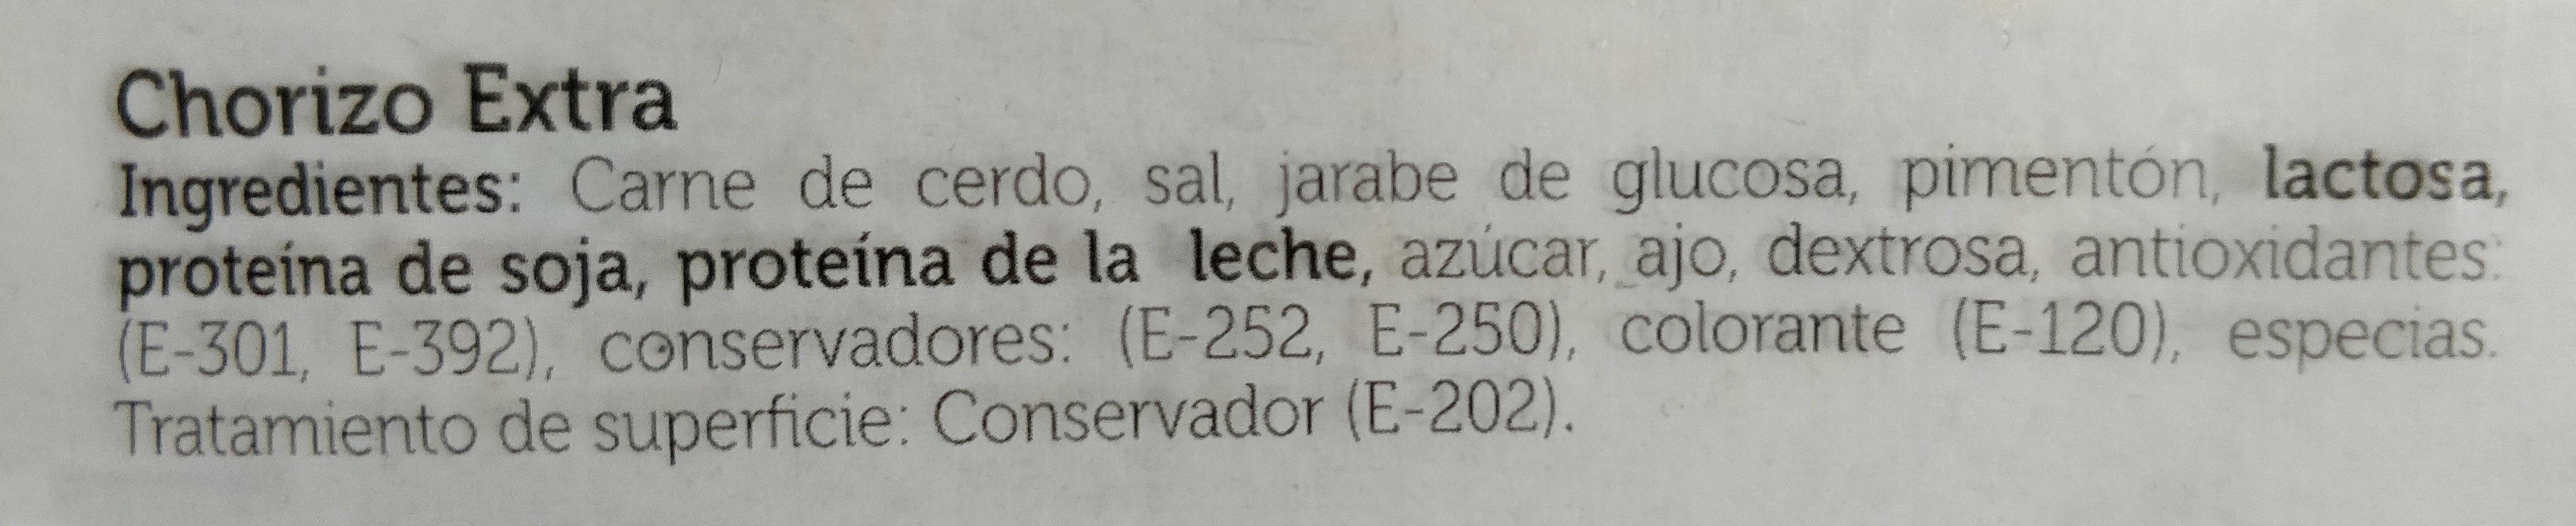 Chorizo Extra - Ingredients